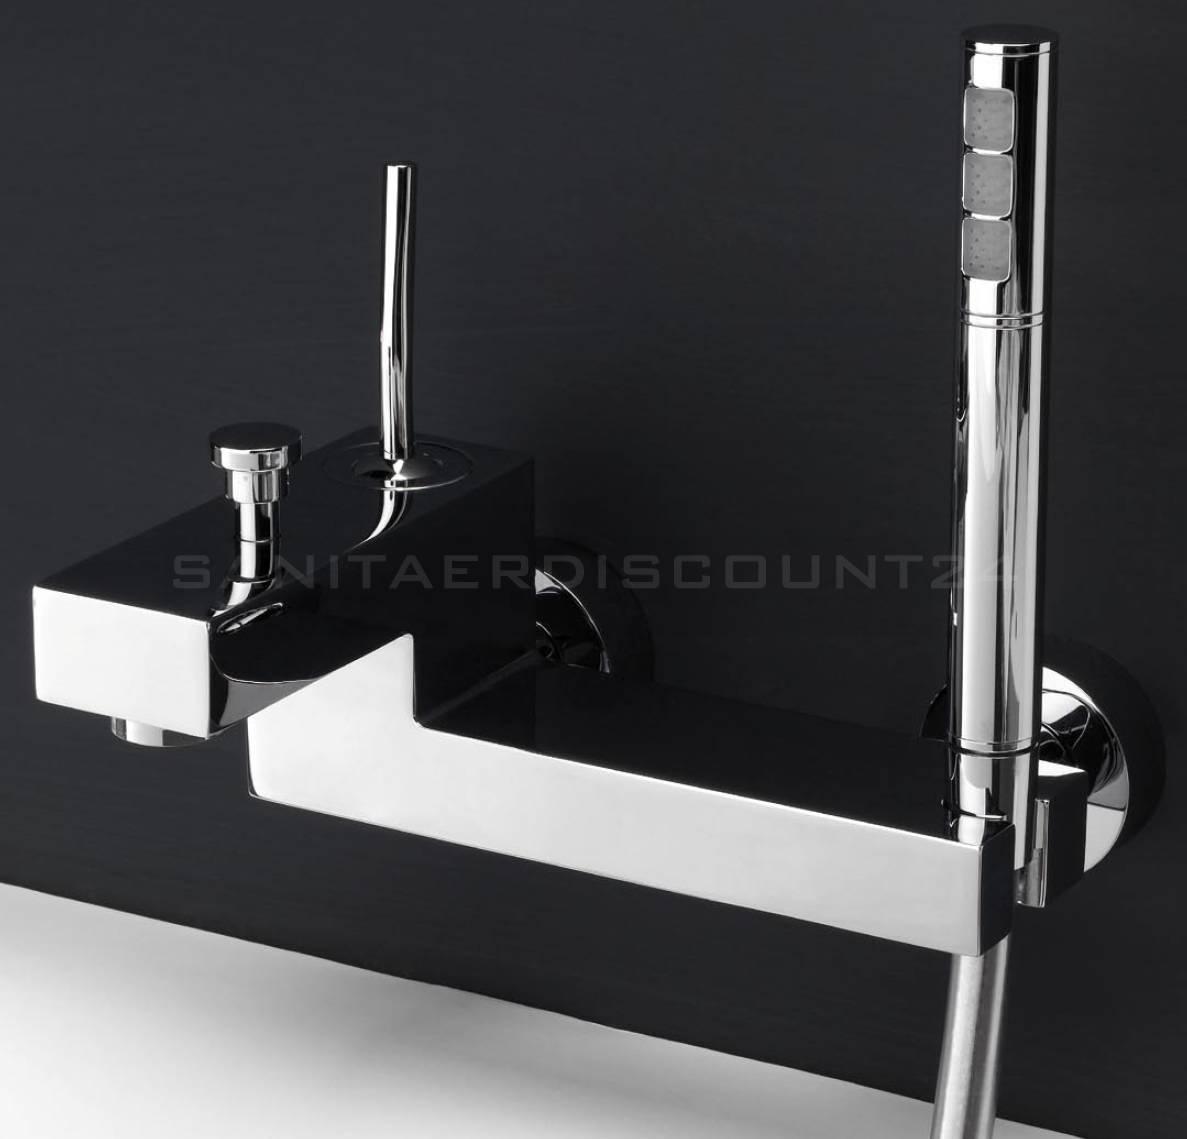 design quadro badewannen armatur hey joe mit brauseset massiv chrom. Black Bedroom Furniture Sets. Home Design Ideas